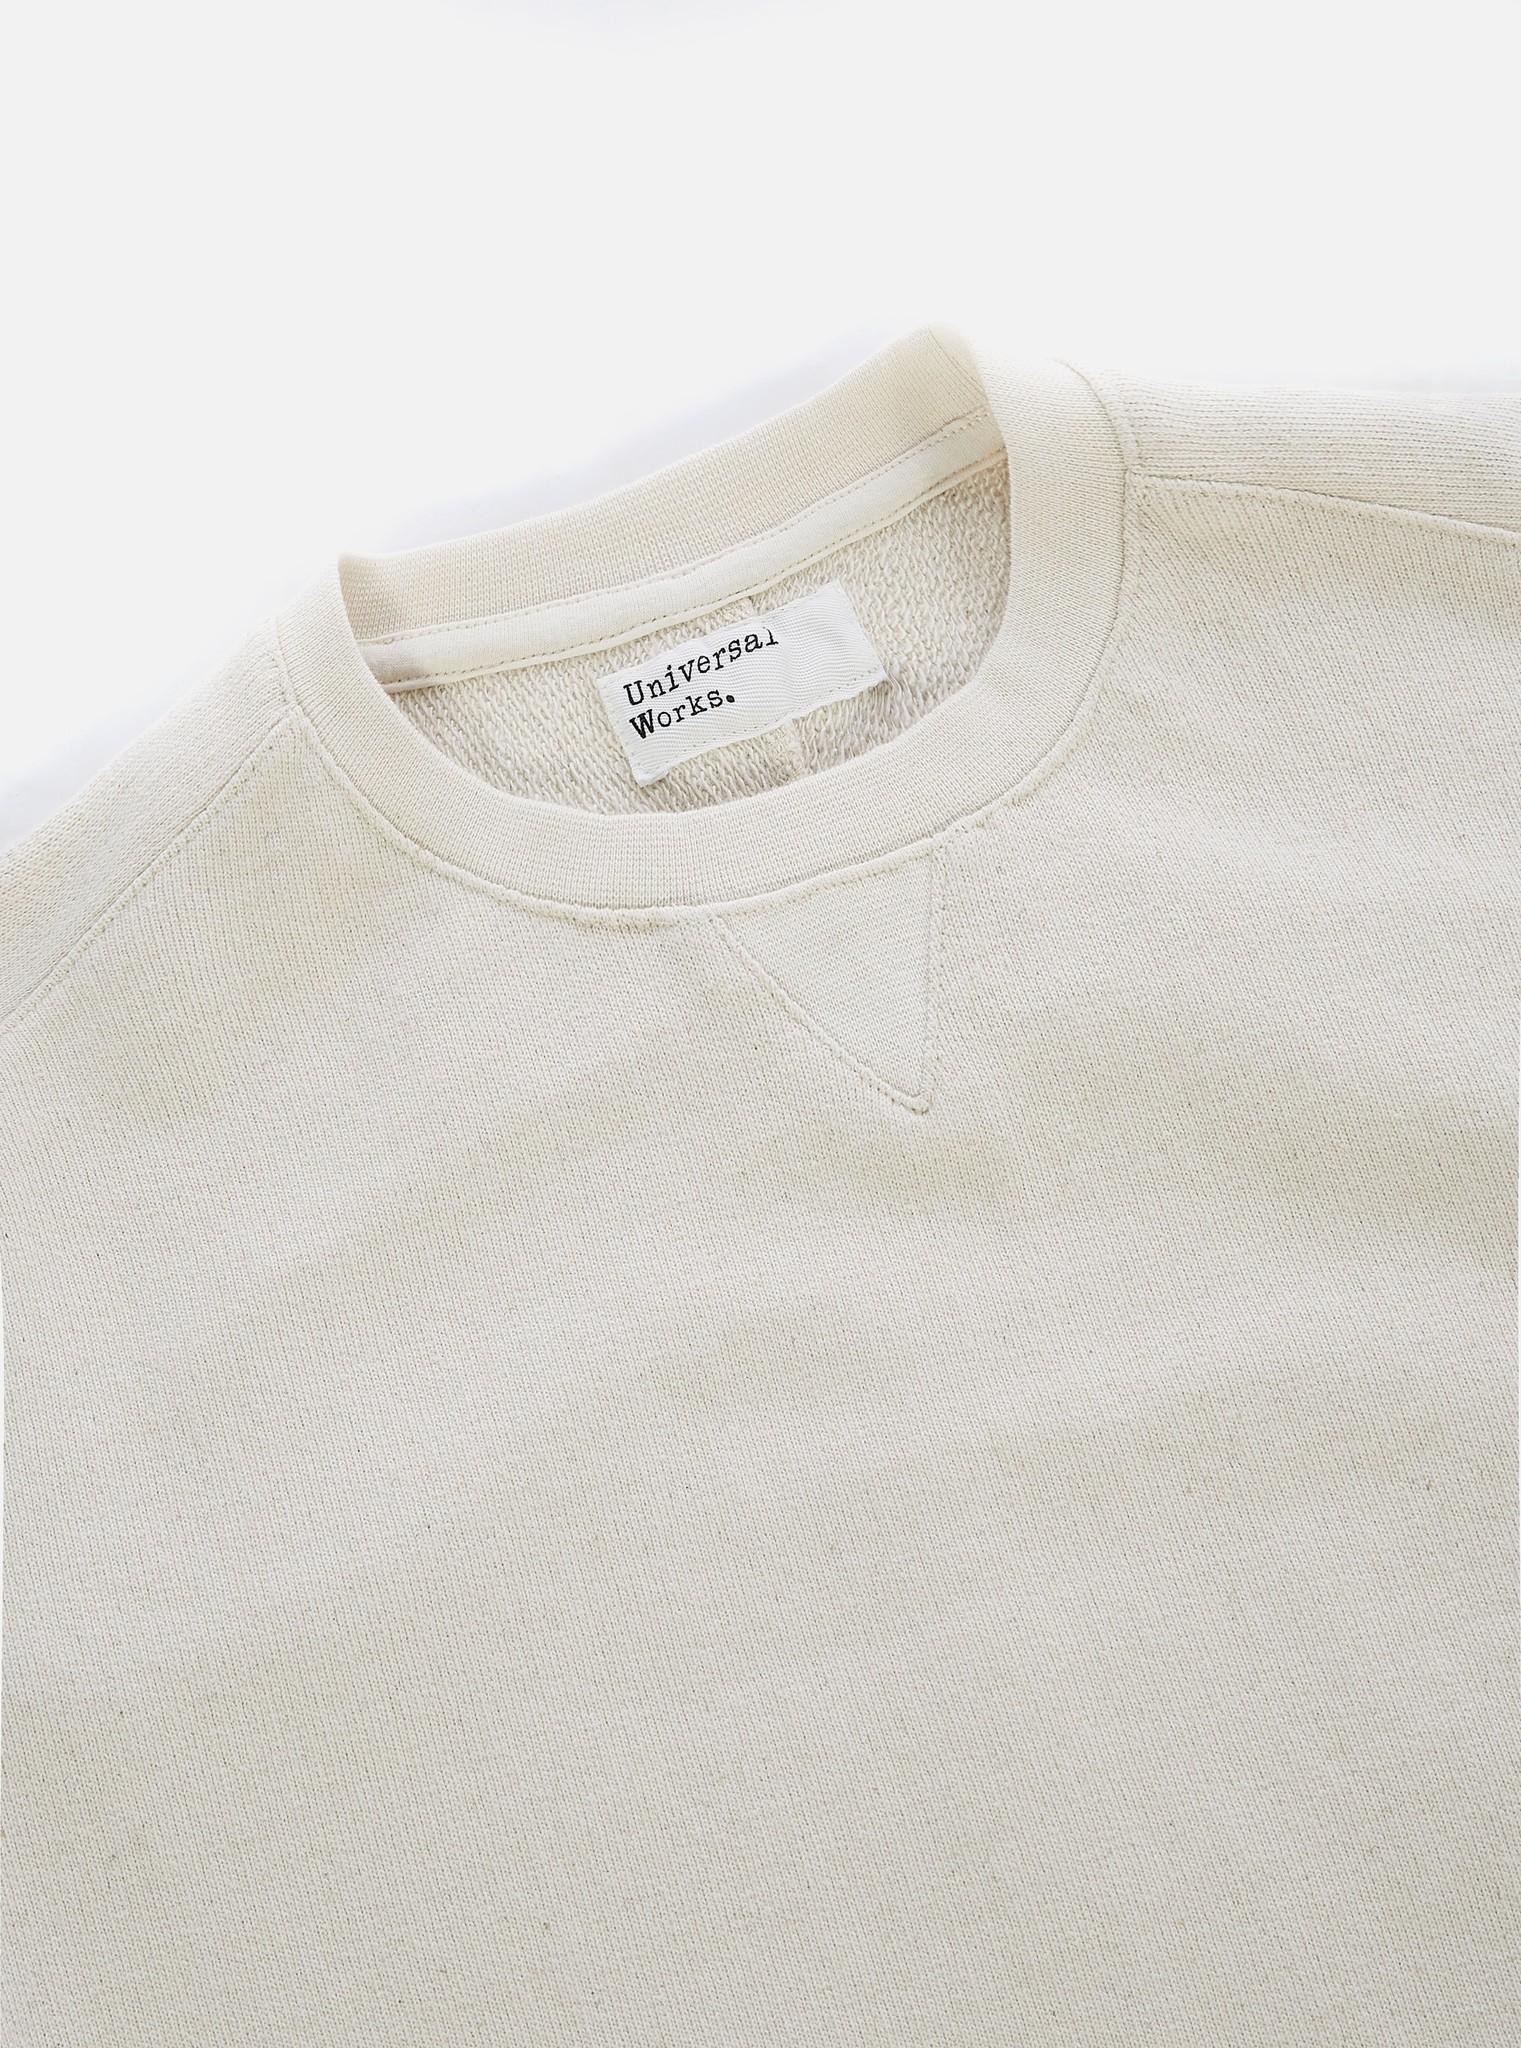 Classic Cotton Crew Sweatshirt Ecru White-2